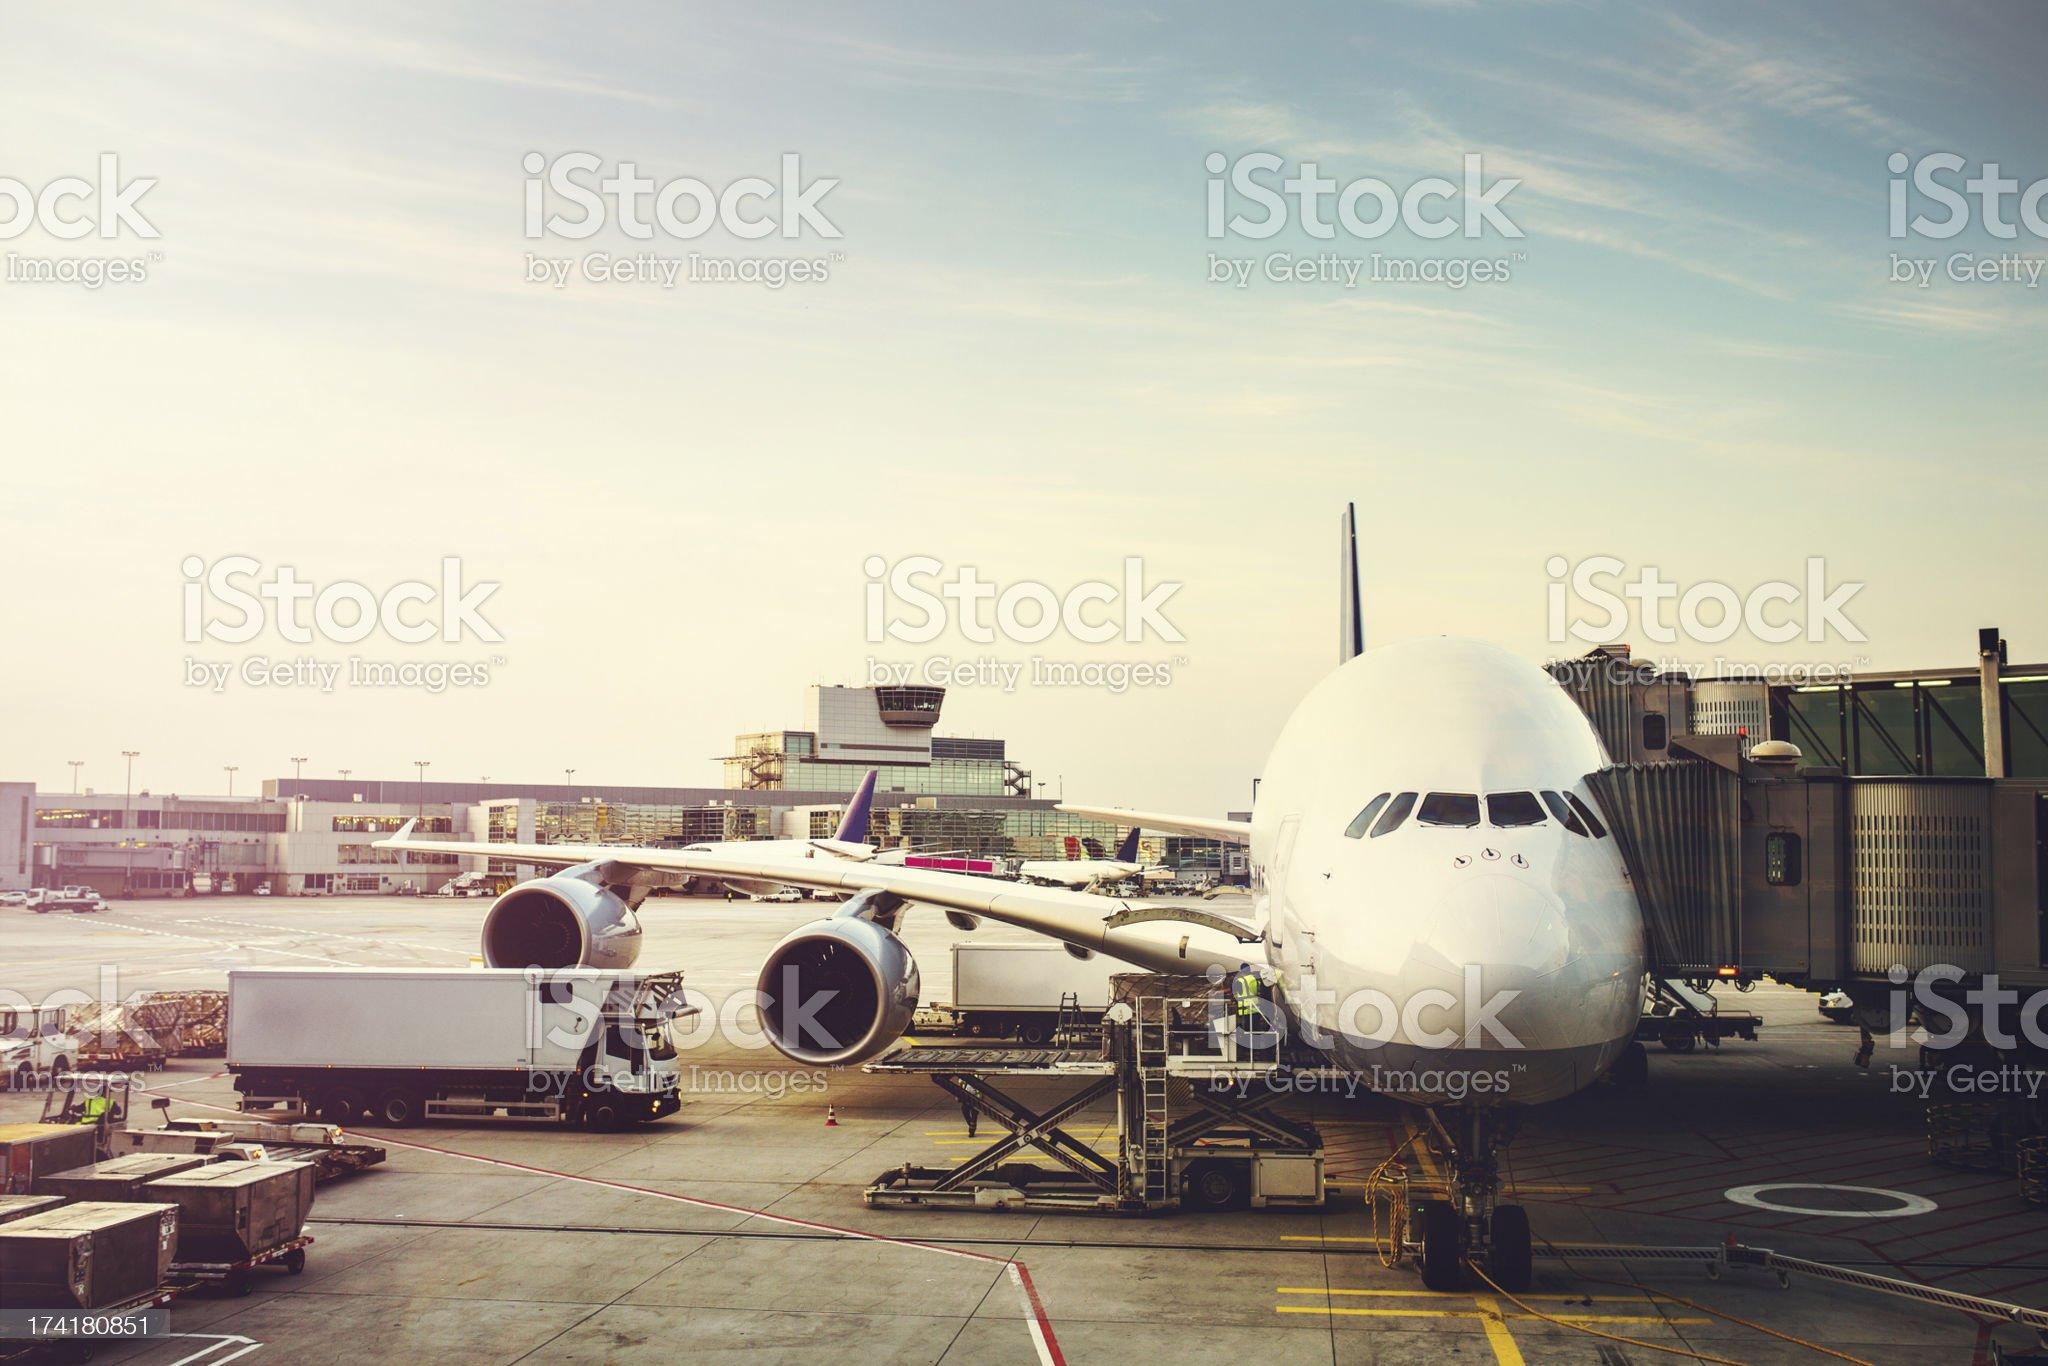 Airplane Preparing to Load on Tarmac royalty-free stock photo